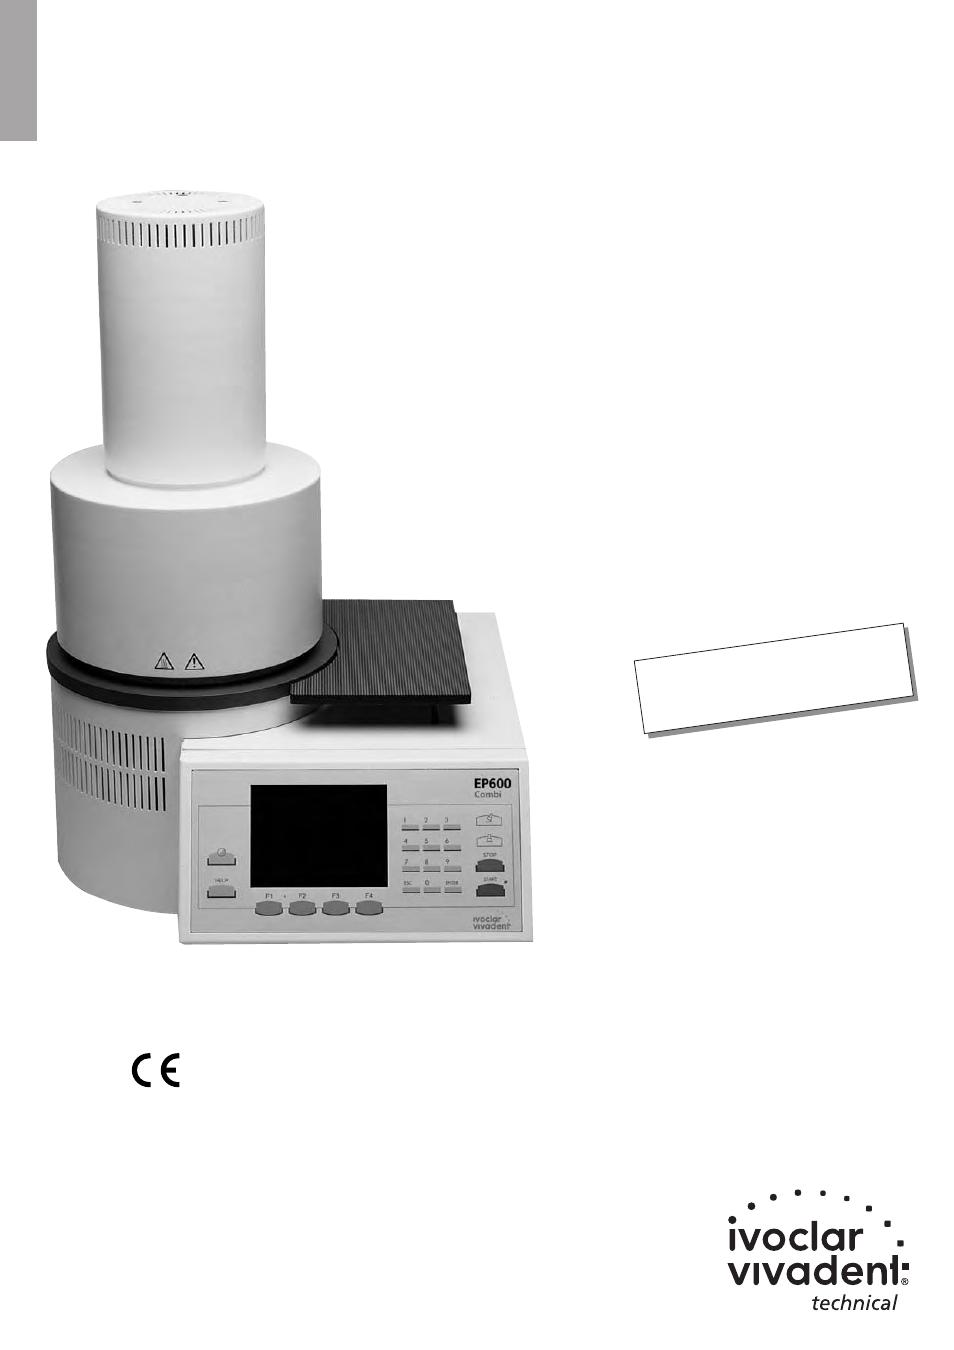 ivoclar vivadent ep 600 combi user manual 40 pages rh manualsdir com